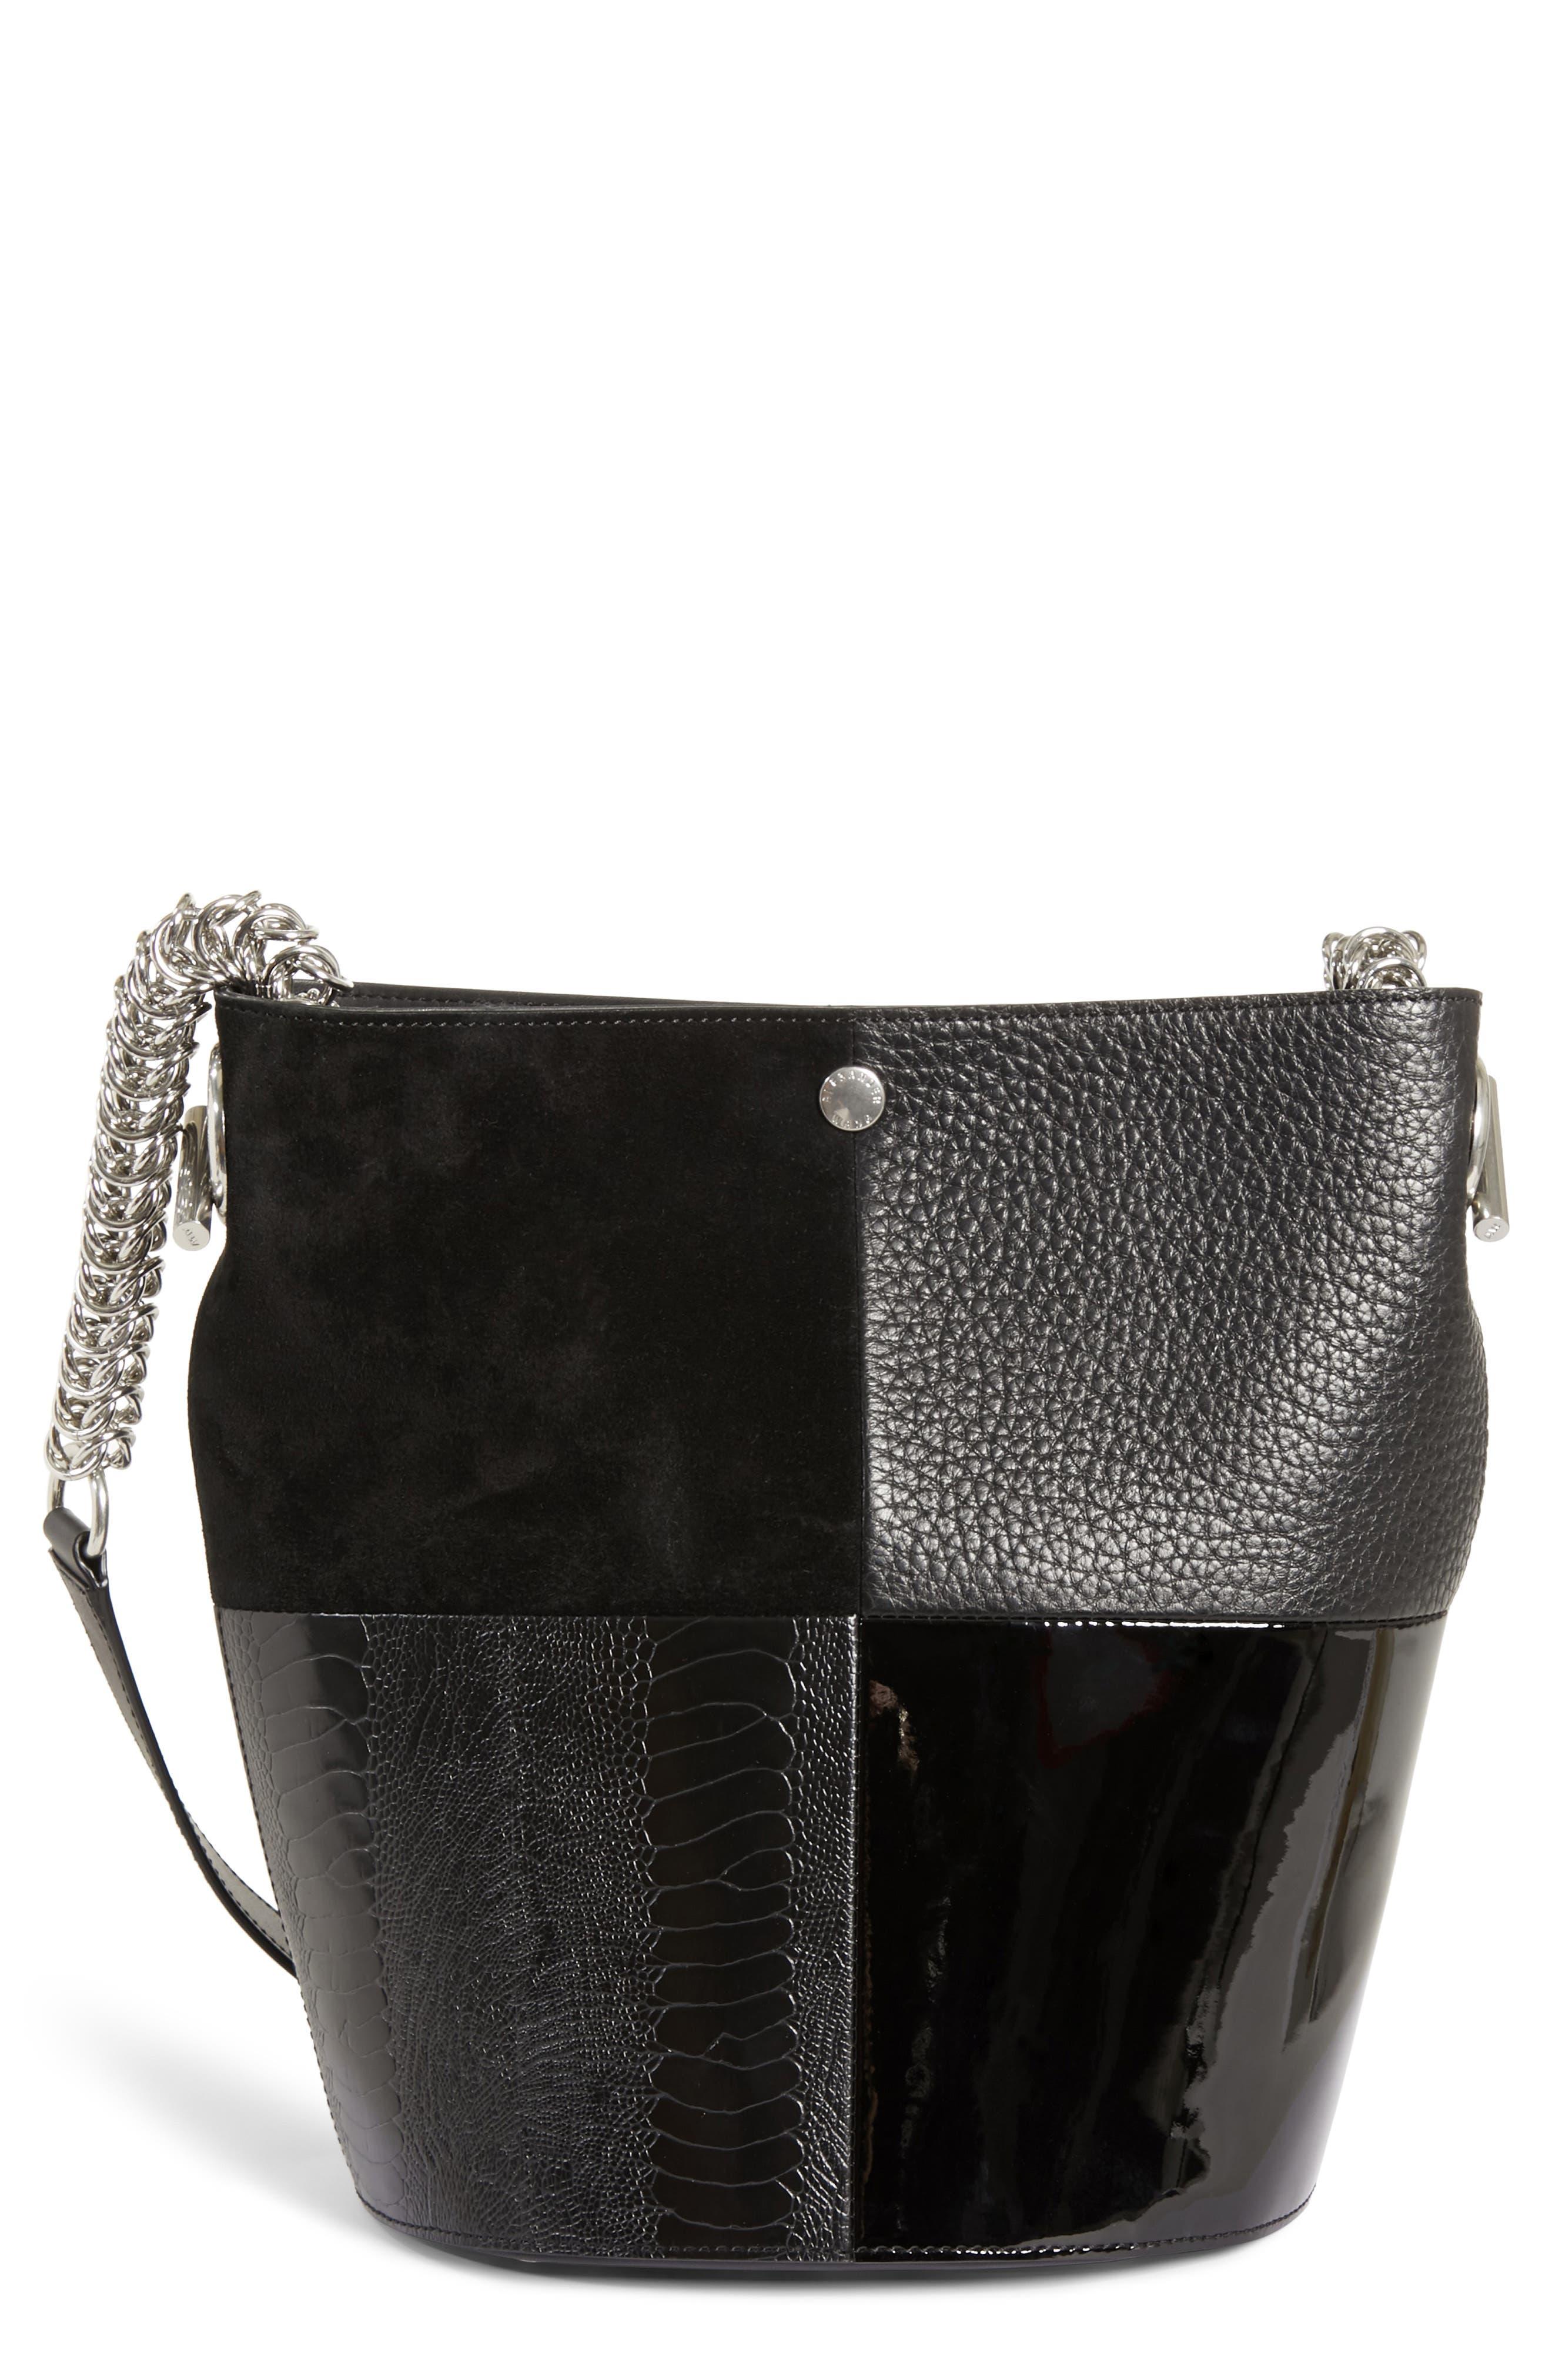 Genesis Patchwork Leather Bucket Bag,                             Main thumbnail 1, color,                             001